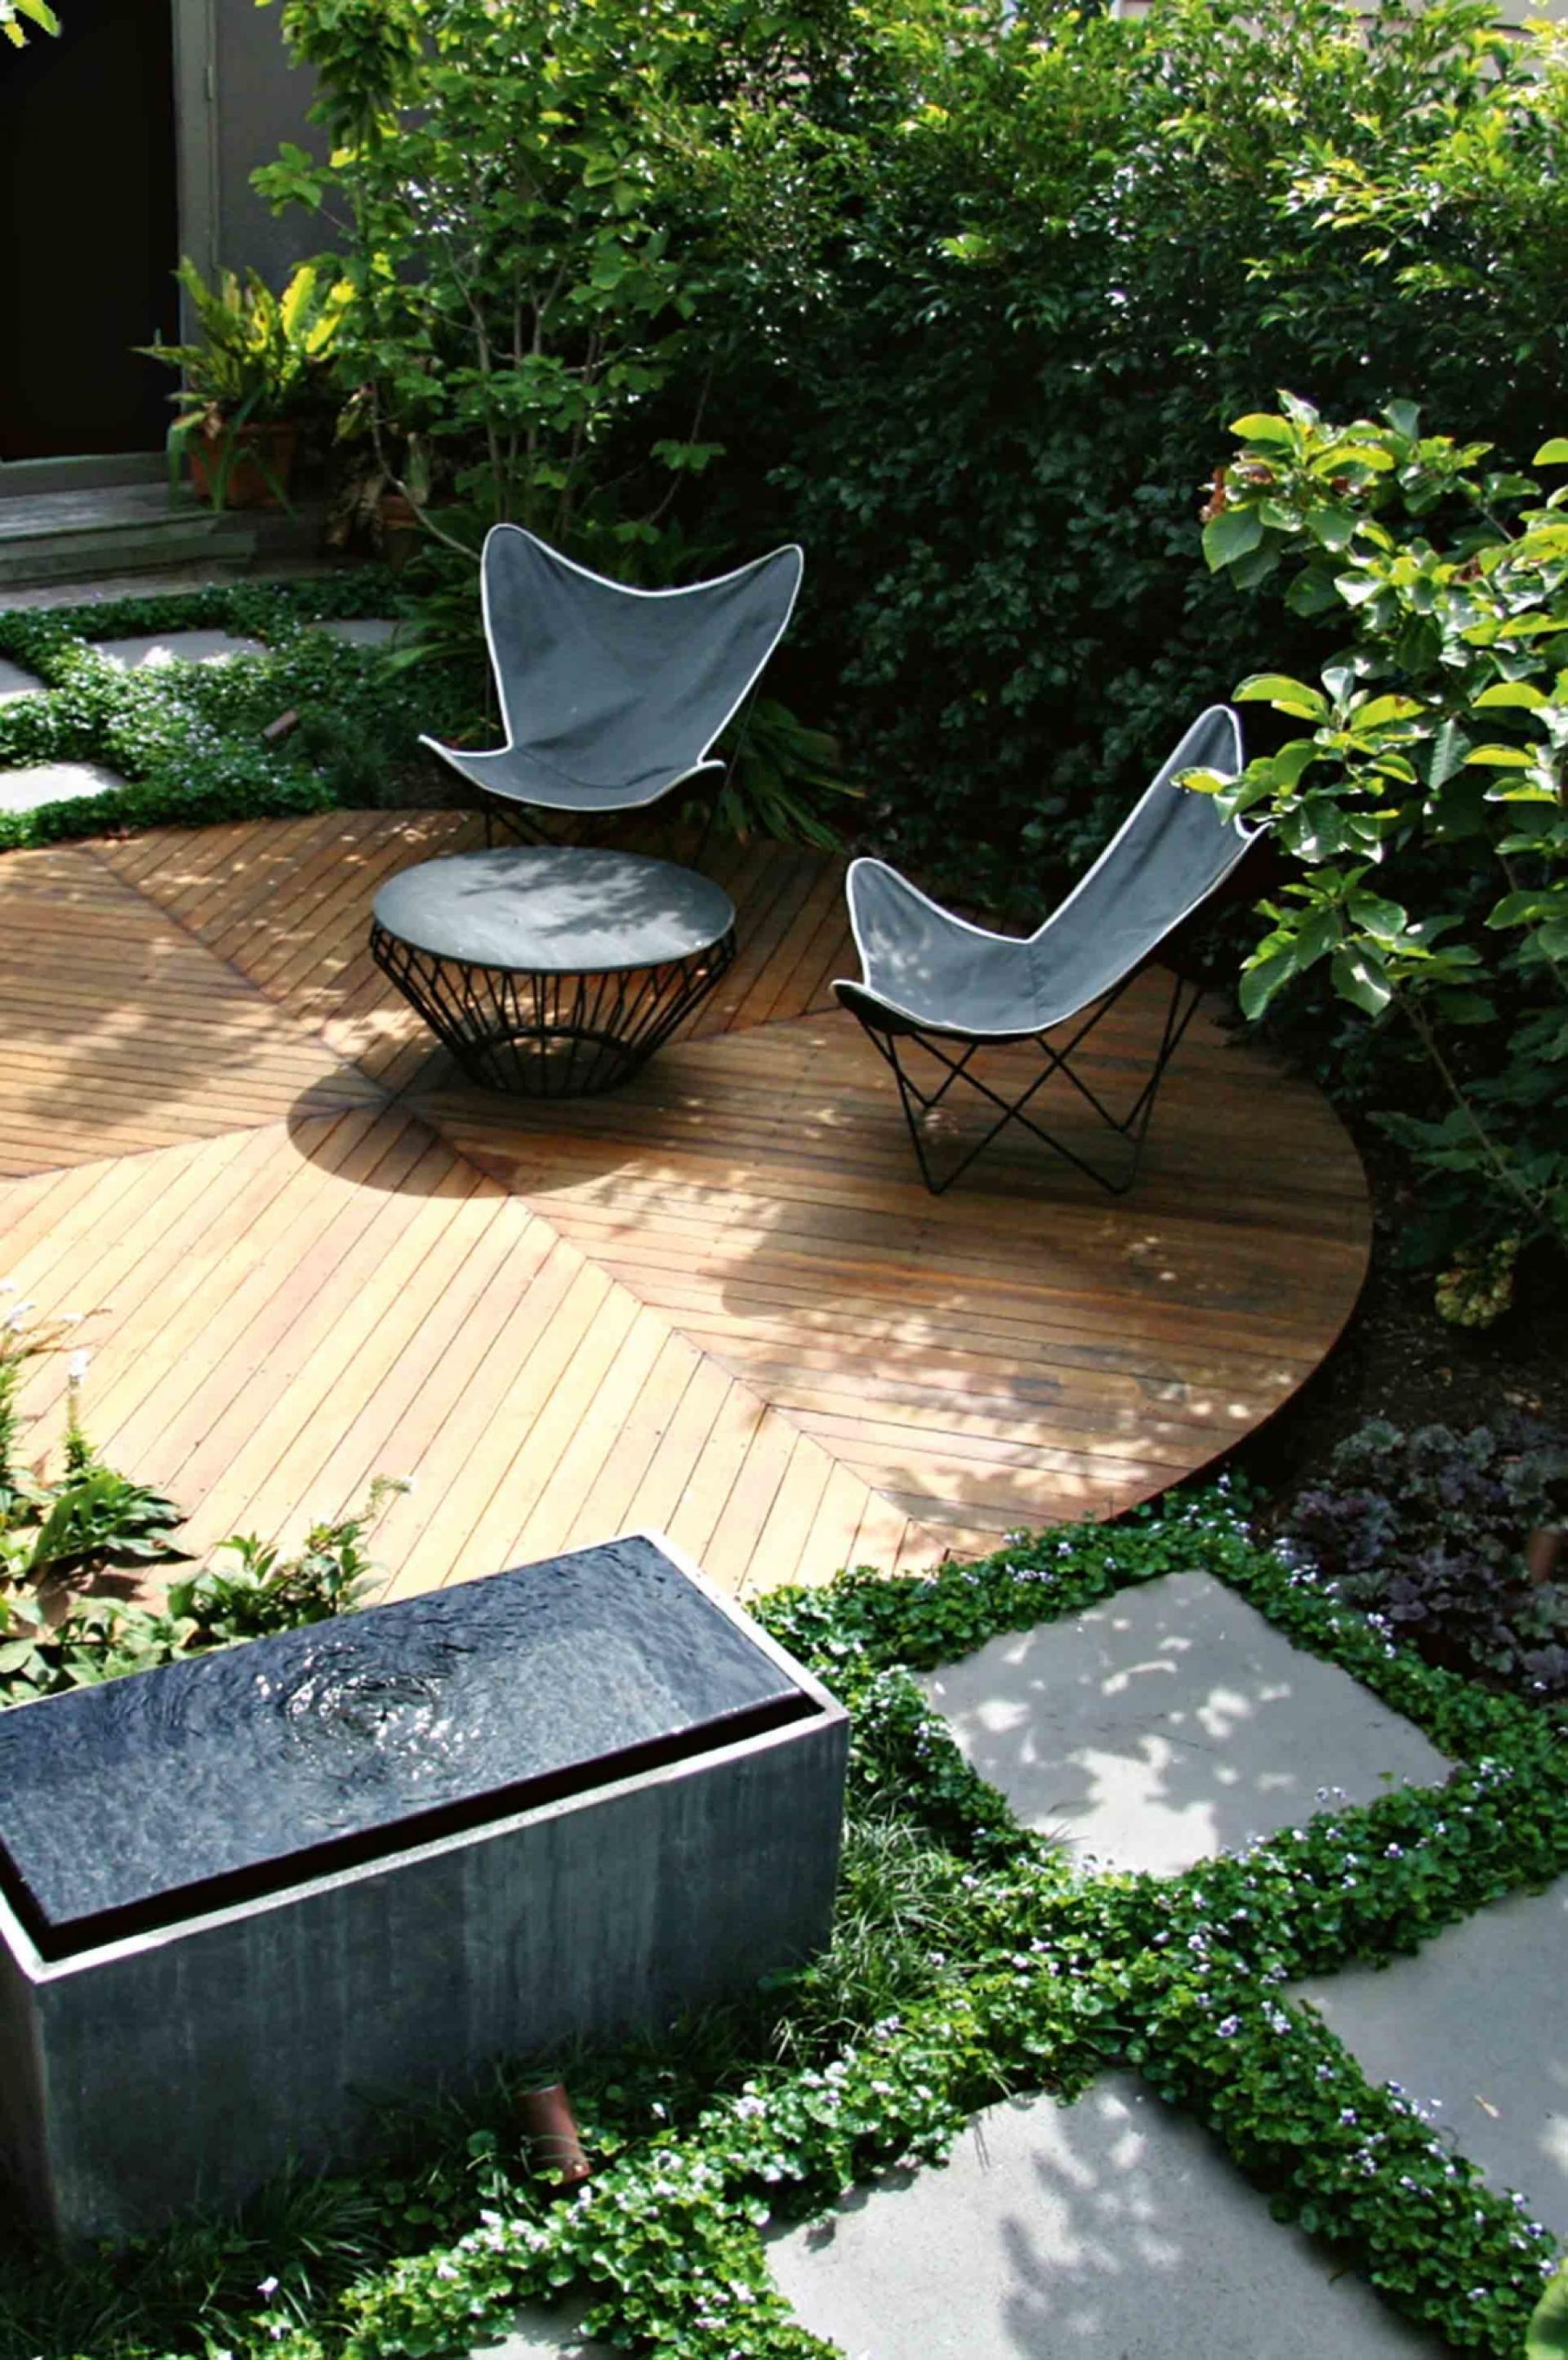 Cottage Garden Design Ideas From A Melbourne Makeover Small Courtyard Gardens Modern Backyard Design Backyard Seating Backyard garden ideas melbourne